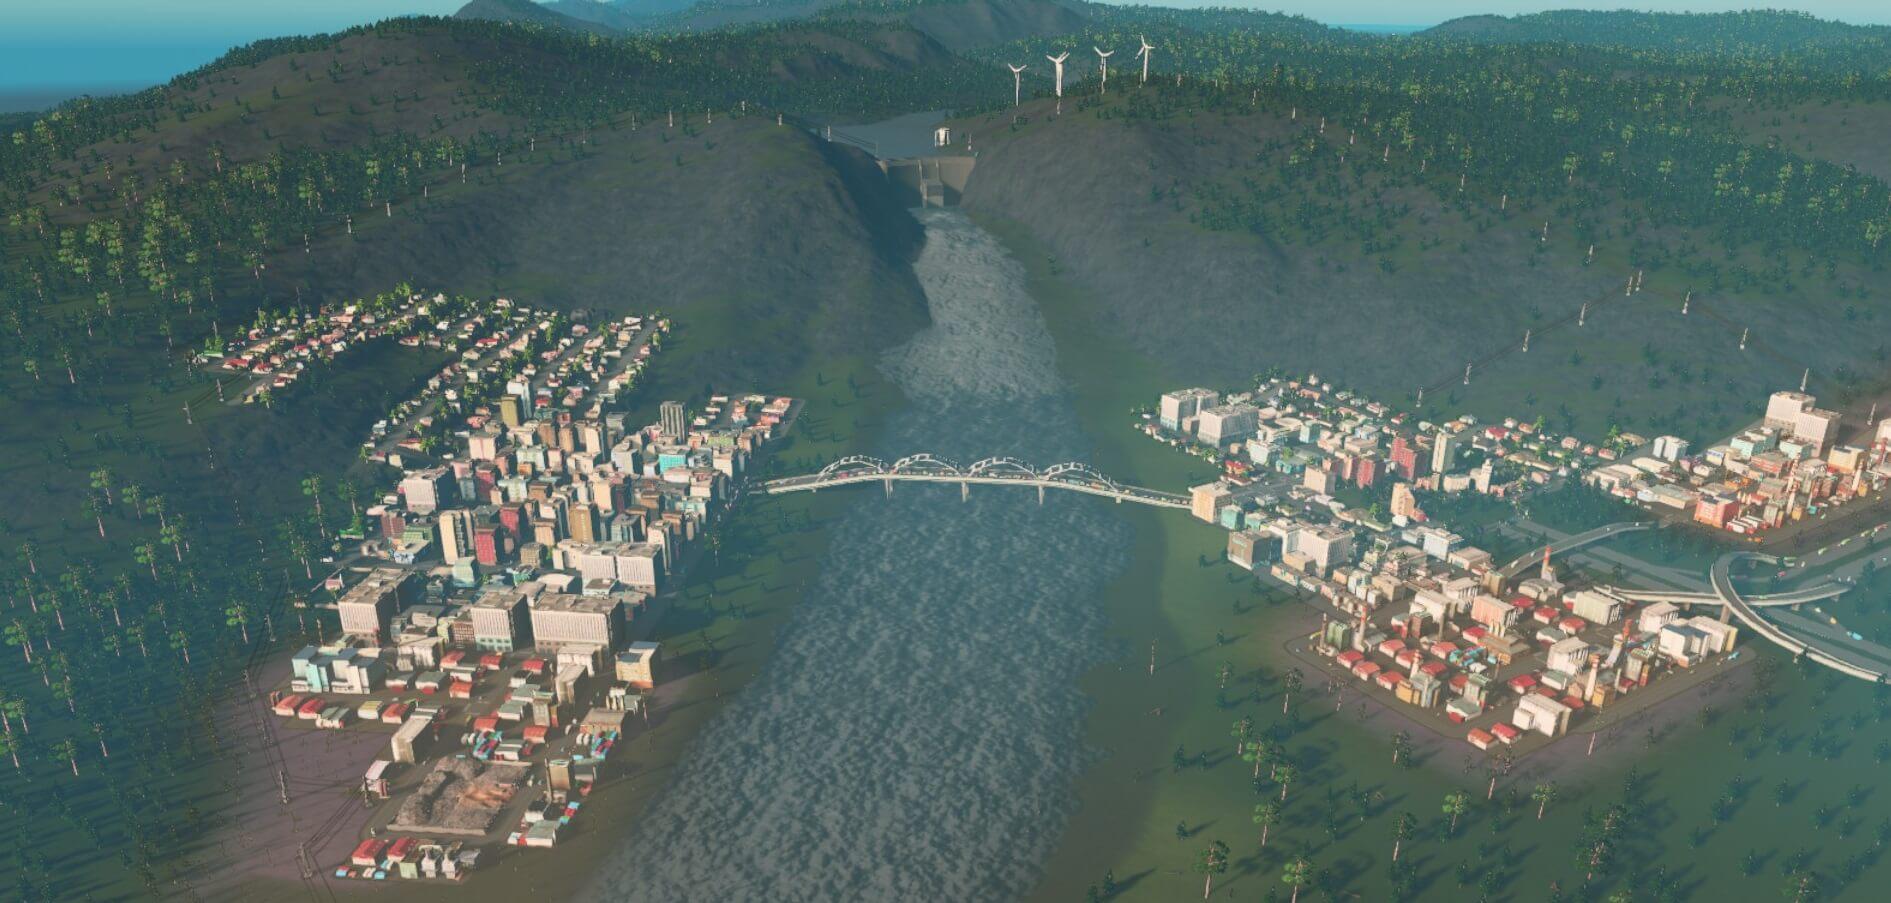 By-the-Dam 【Cities:skylines 攻略ブログ】  シナリオ バイ・ザ・ダム 65万人の都市に育てる Cities:Skylines(シティーズ:スカイライン ) 街作りシミュレーションゲーム